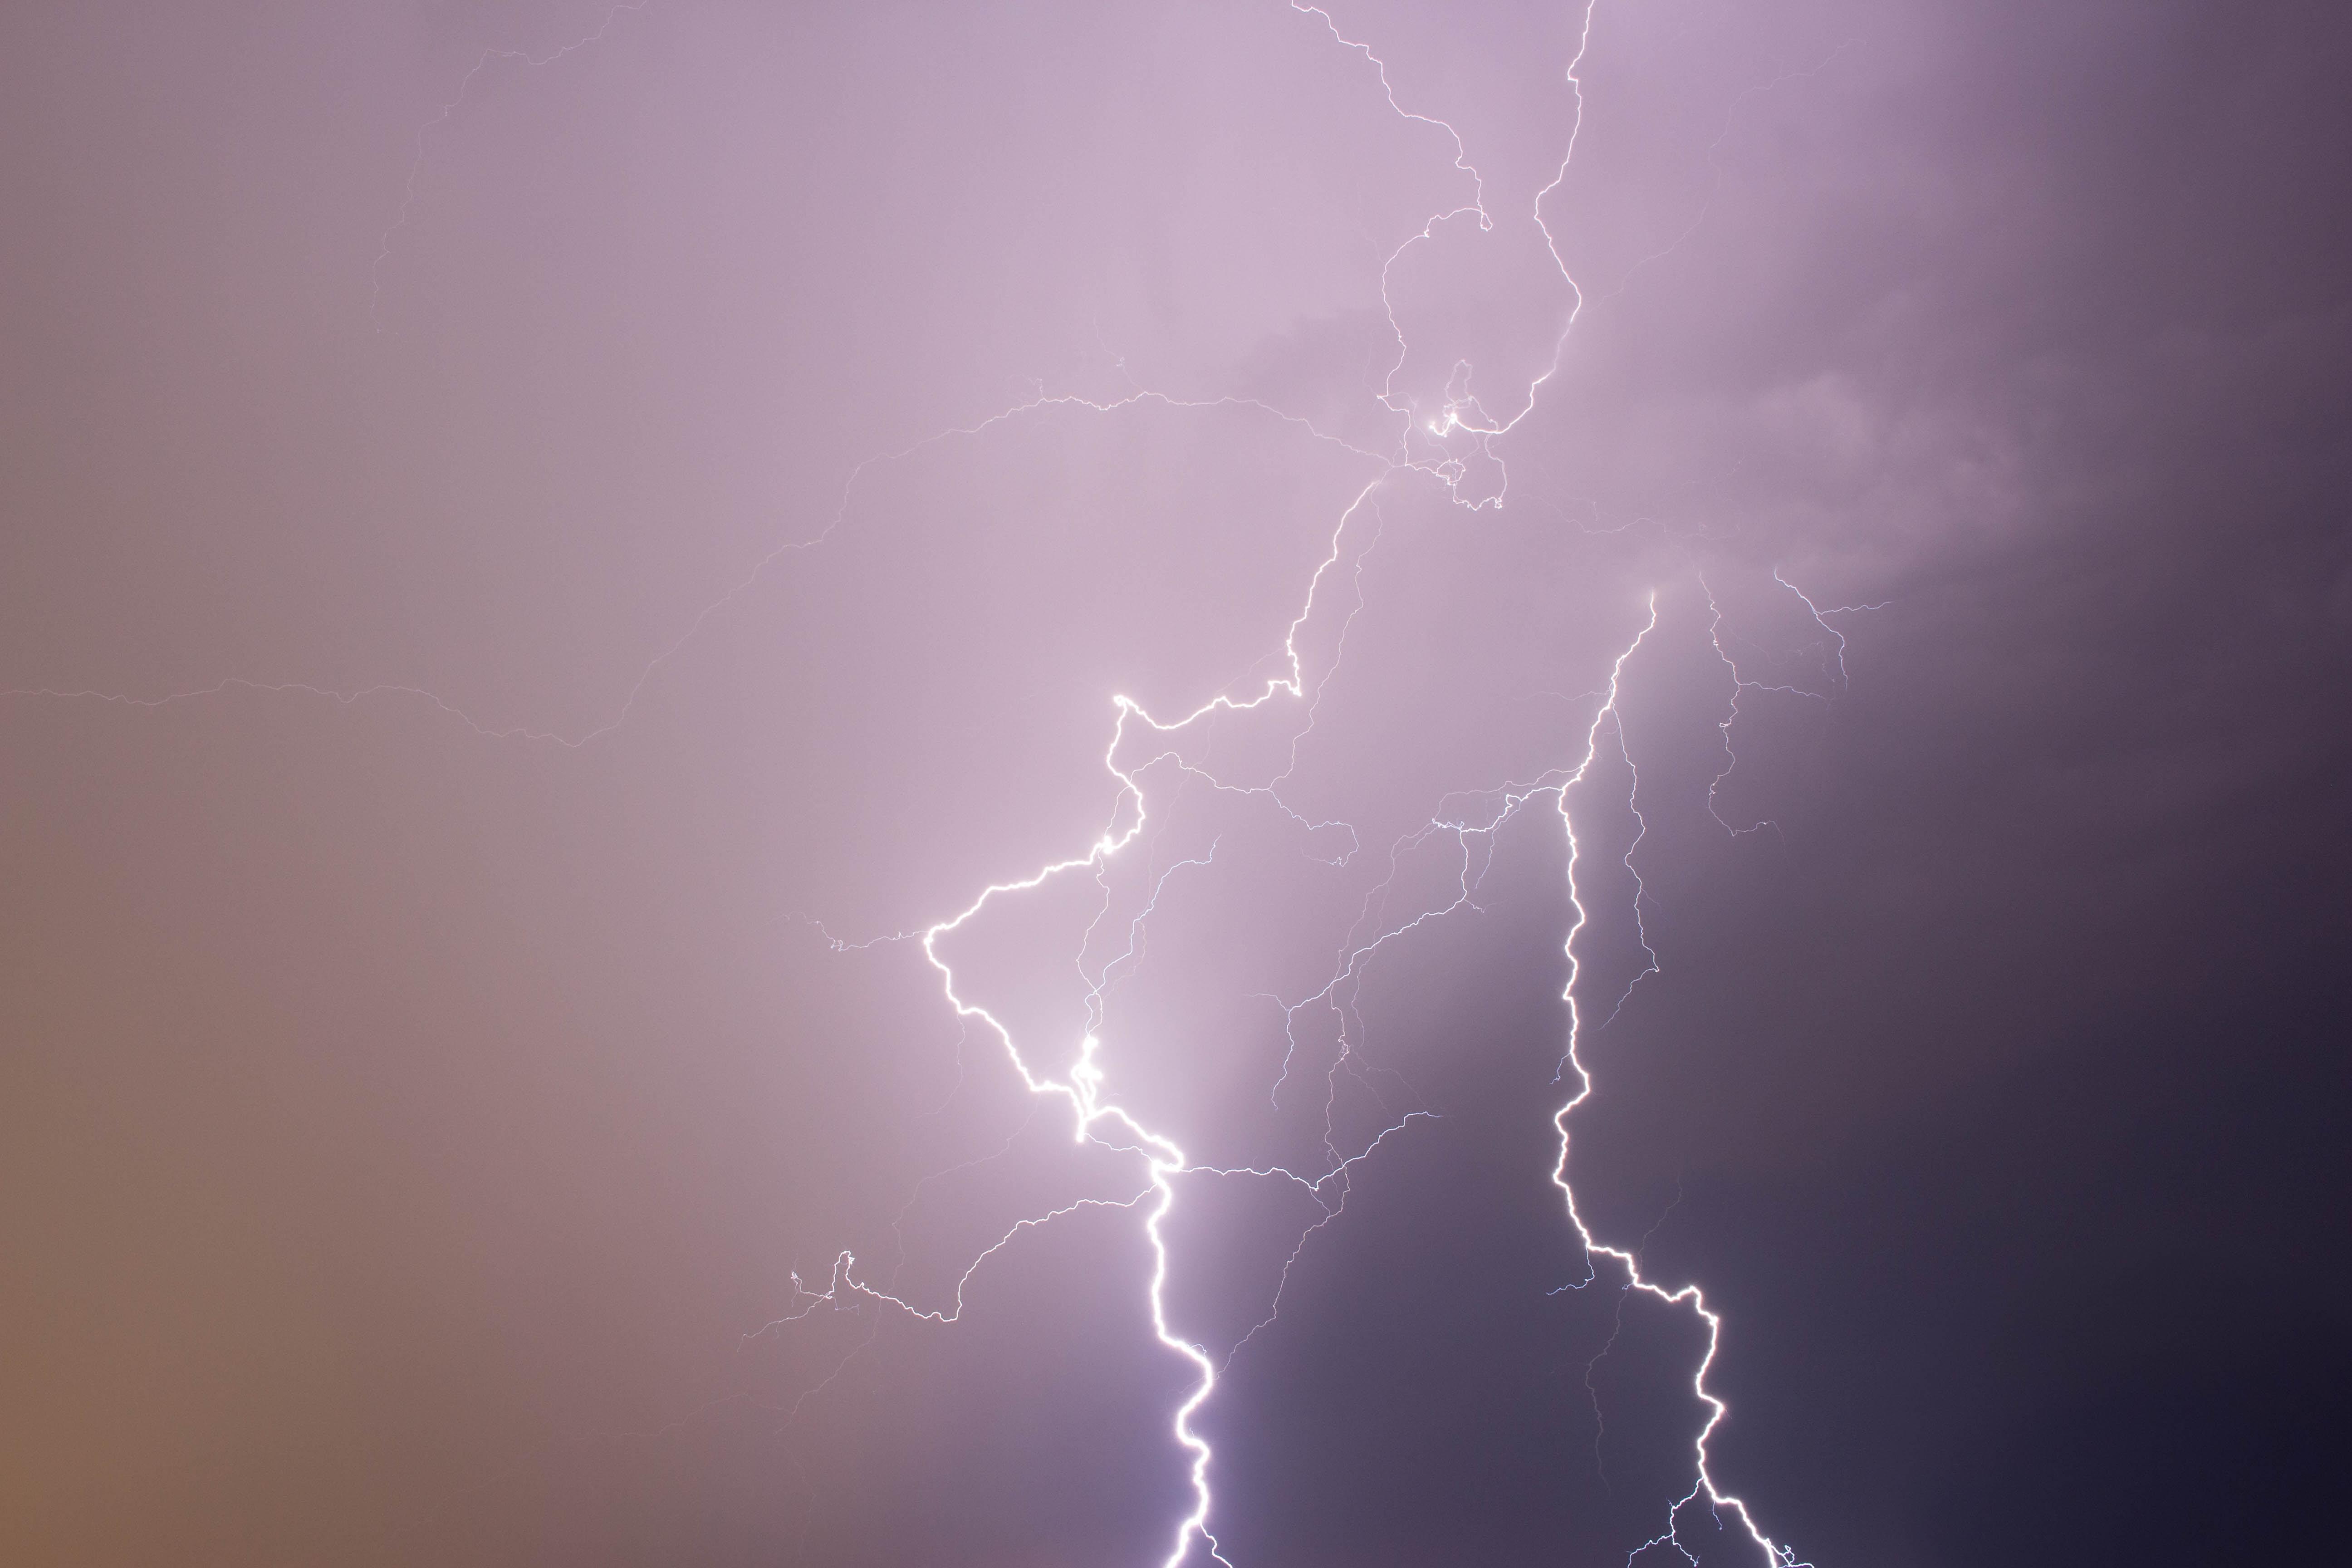 lightning strikes under cloudy storm